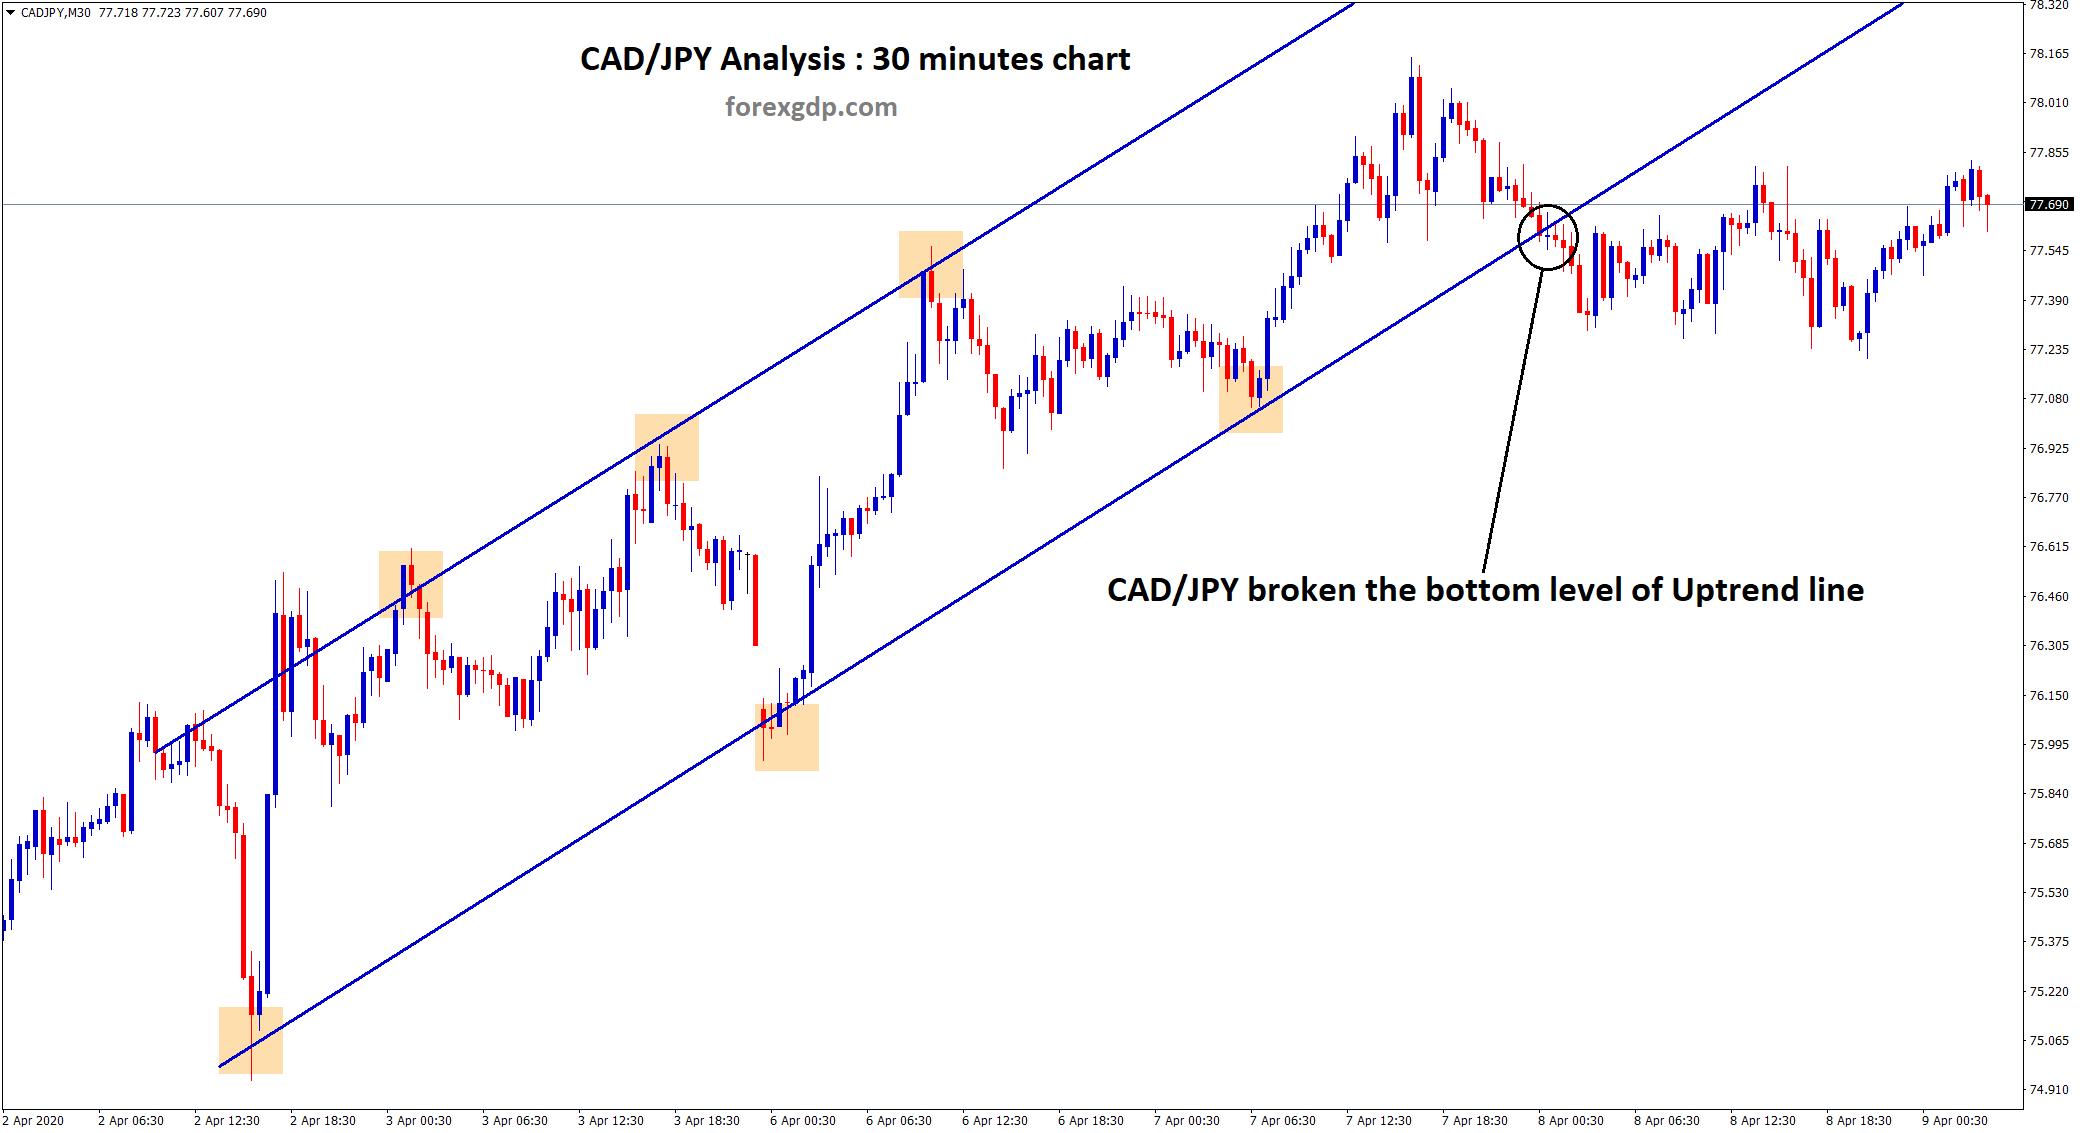 Descending channel broken in cadjpy 30 minutes chart